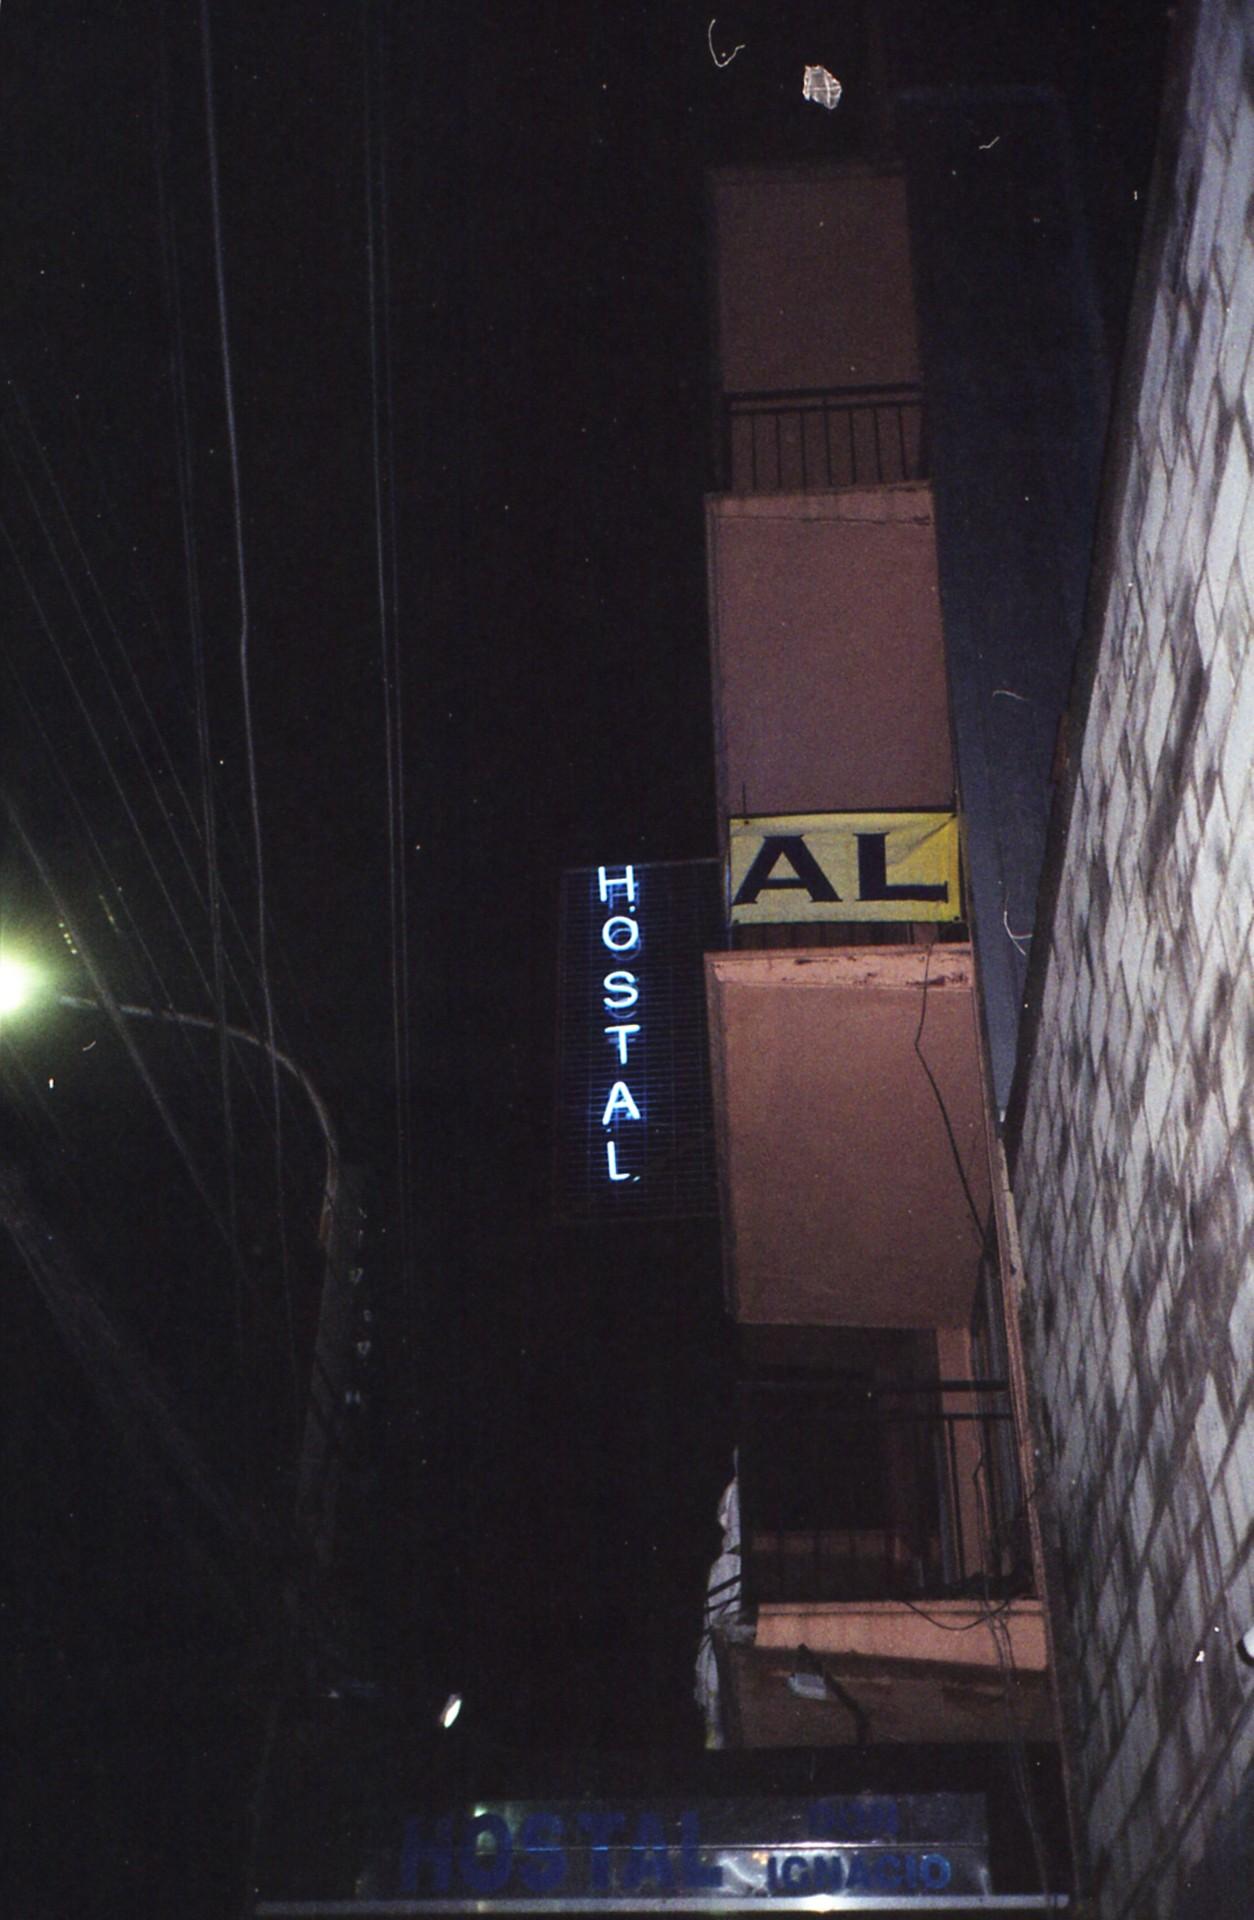 "invierno 2018. ""it gets lonliest (sic) at night, down at the liquor store. beneath the neon sky, our moonlight…"" te busqué tanto, al final me encontré conmigo. #35mm#filmisnotdead#analogphotography#street#night#hostal#neon#kissthebottle#jawbreaker"